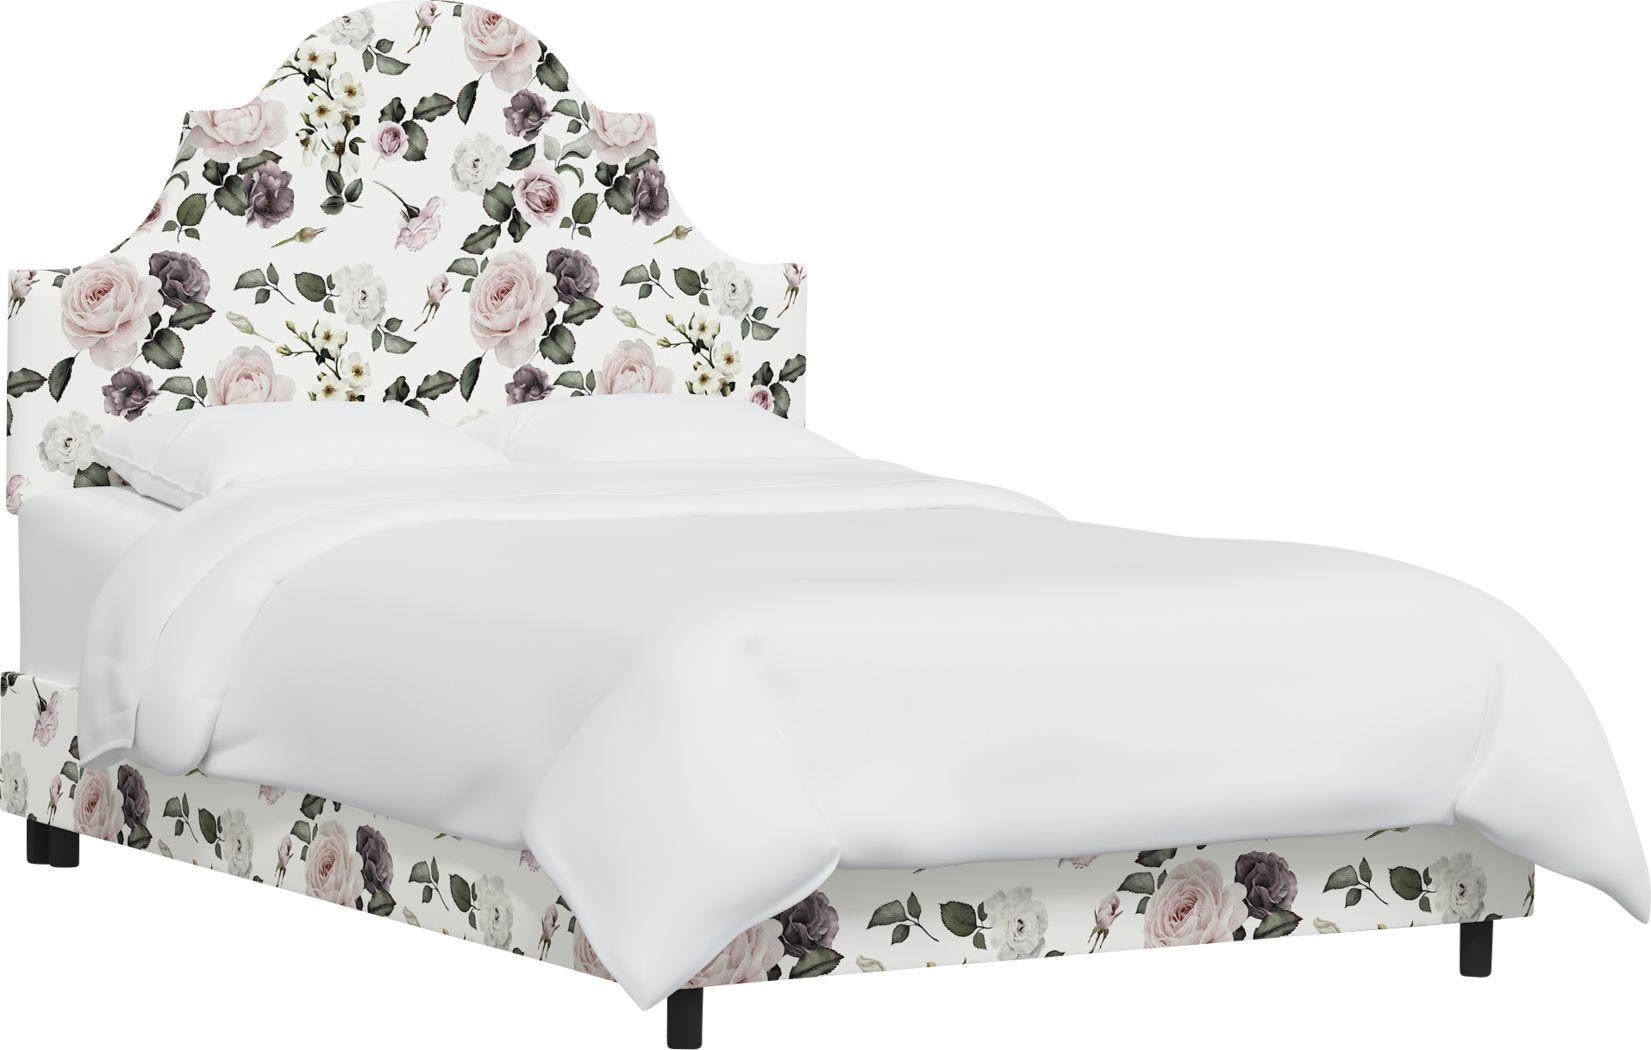 Barn Chic Cream King Upholstered Bed